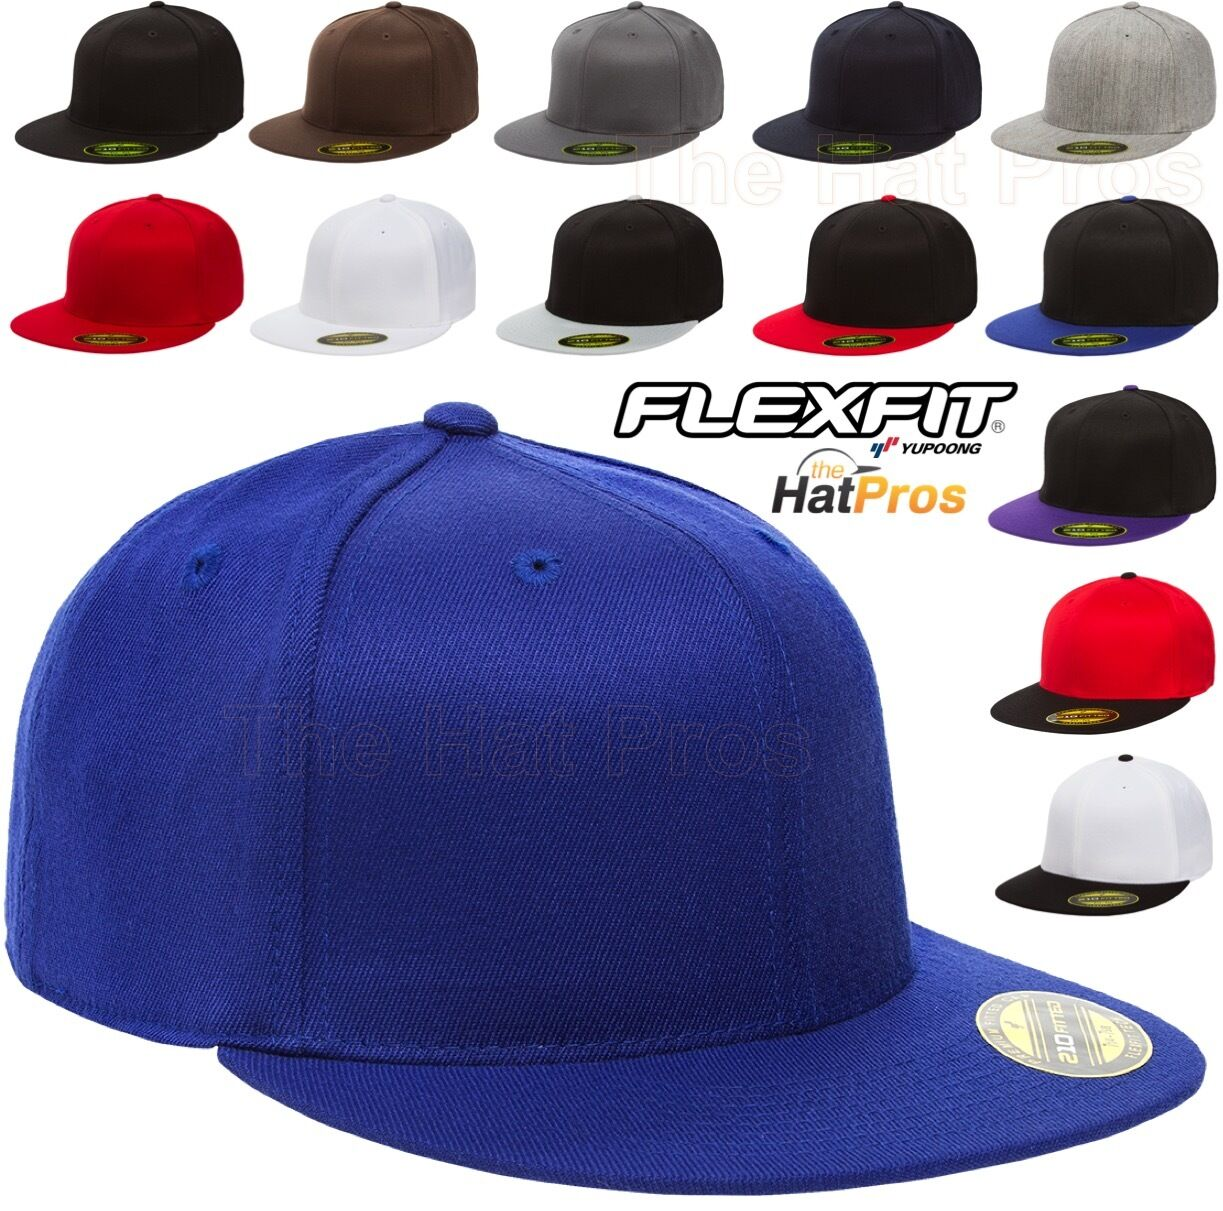 6210/T New Flexfit Premium Flatbill Fiited Baseball Cap 210